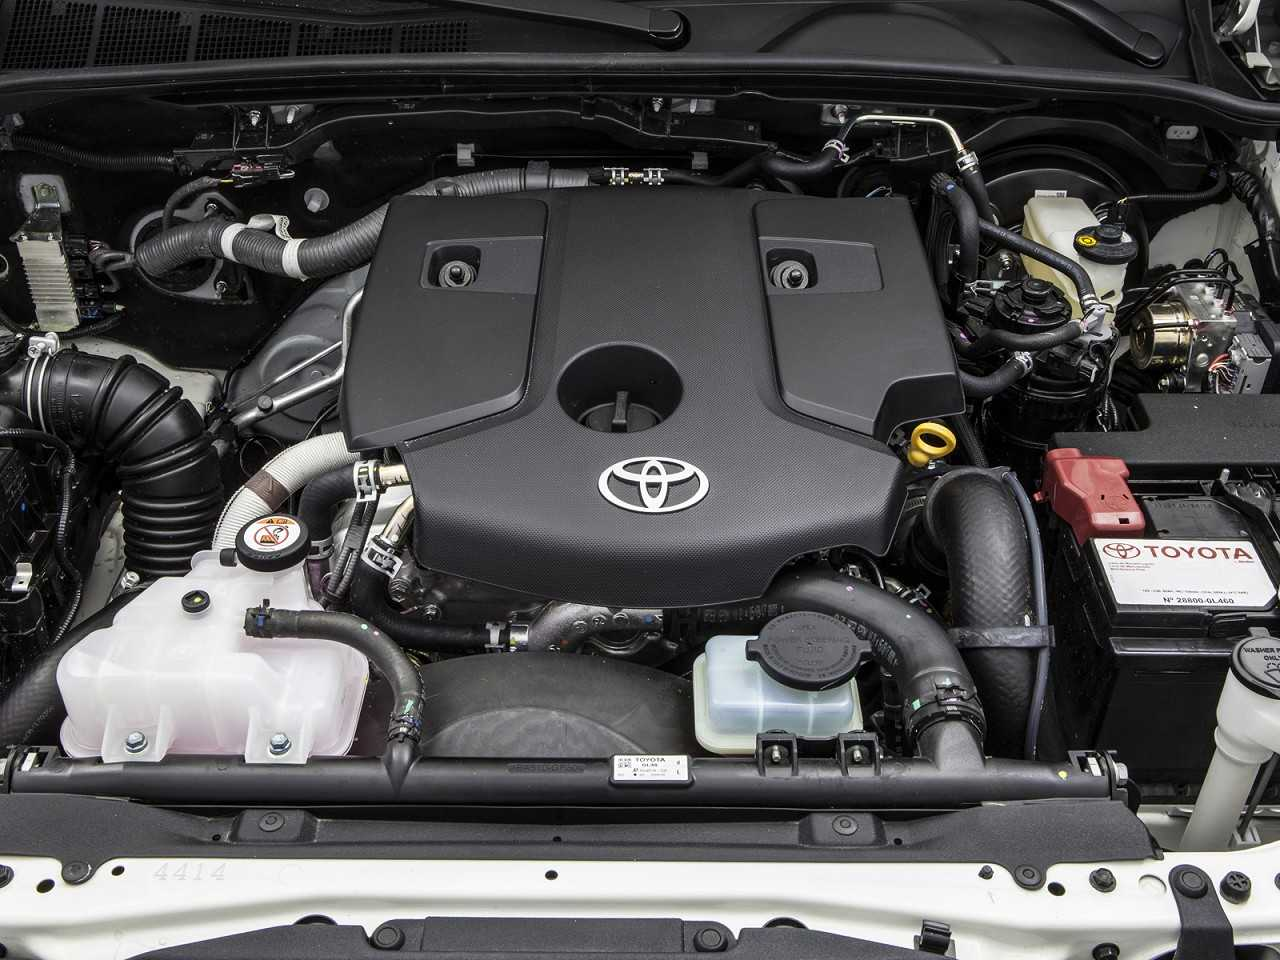 ToyotaHilux 2018 - motor